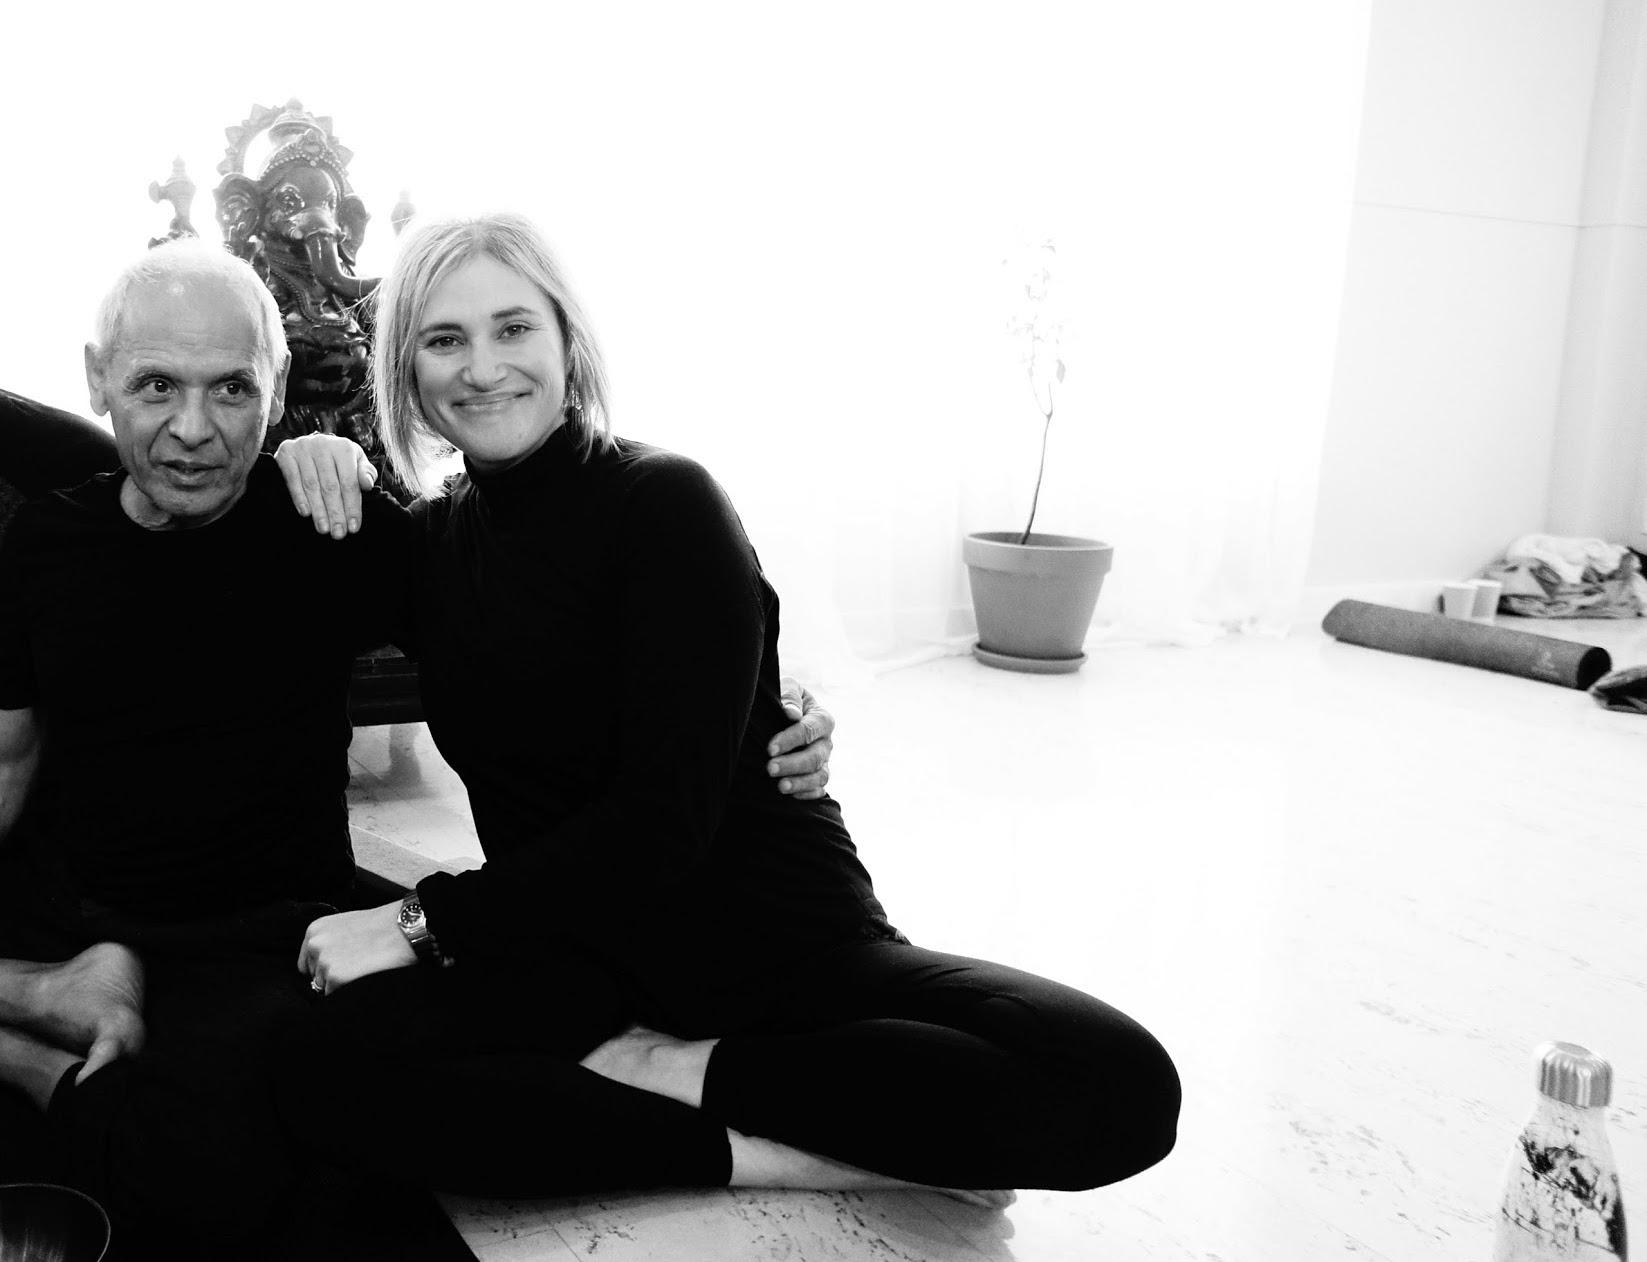 April 29, 2018 Yoga with Master Robert Boustaney